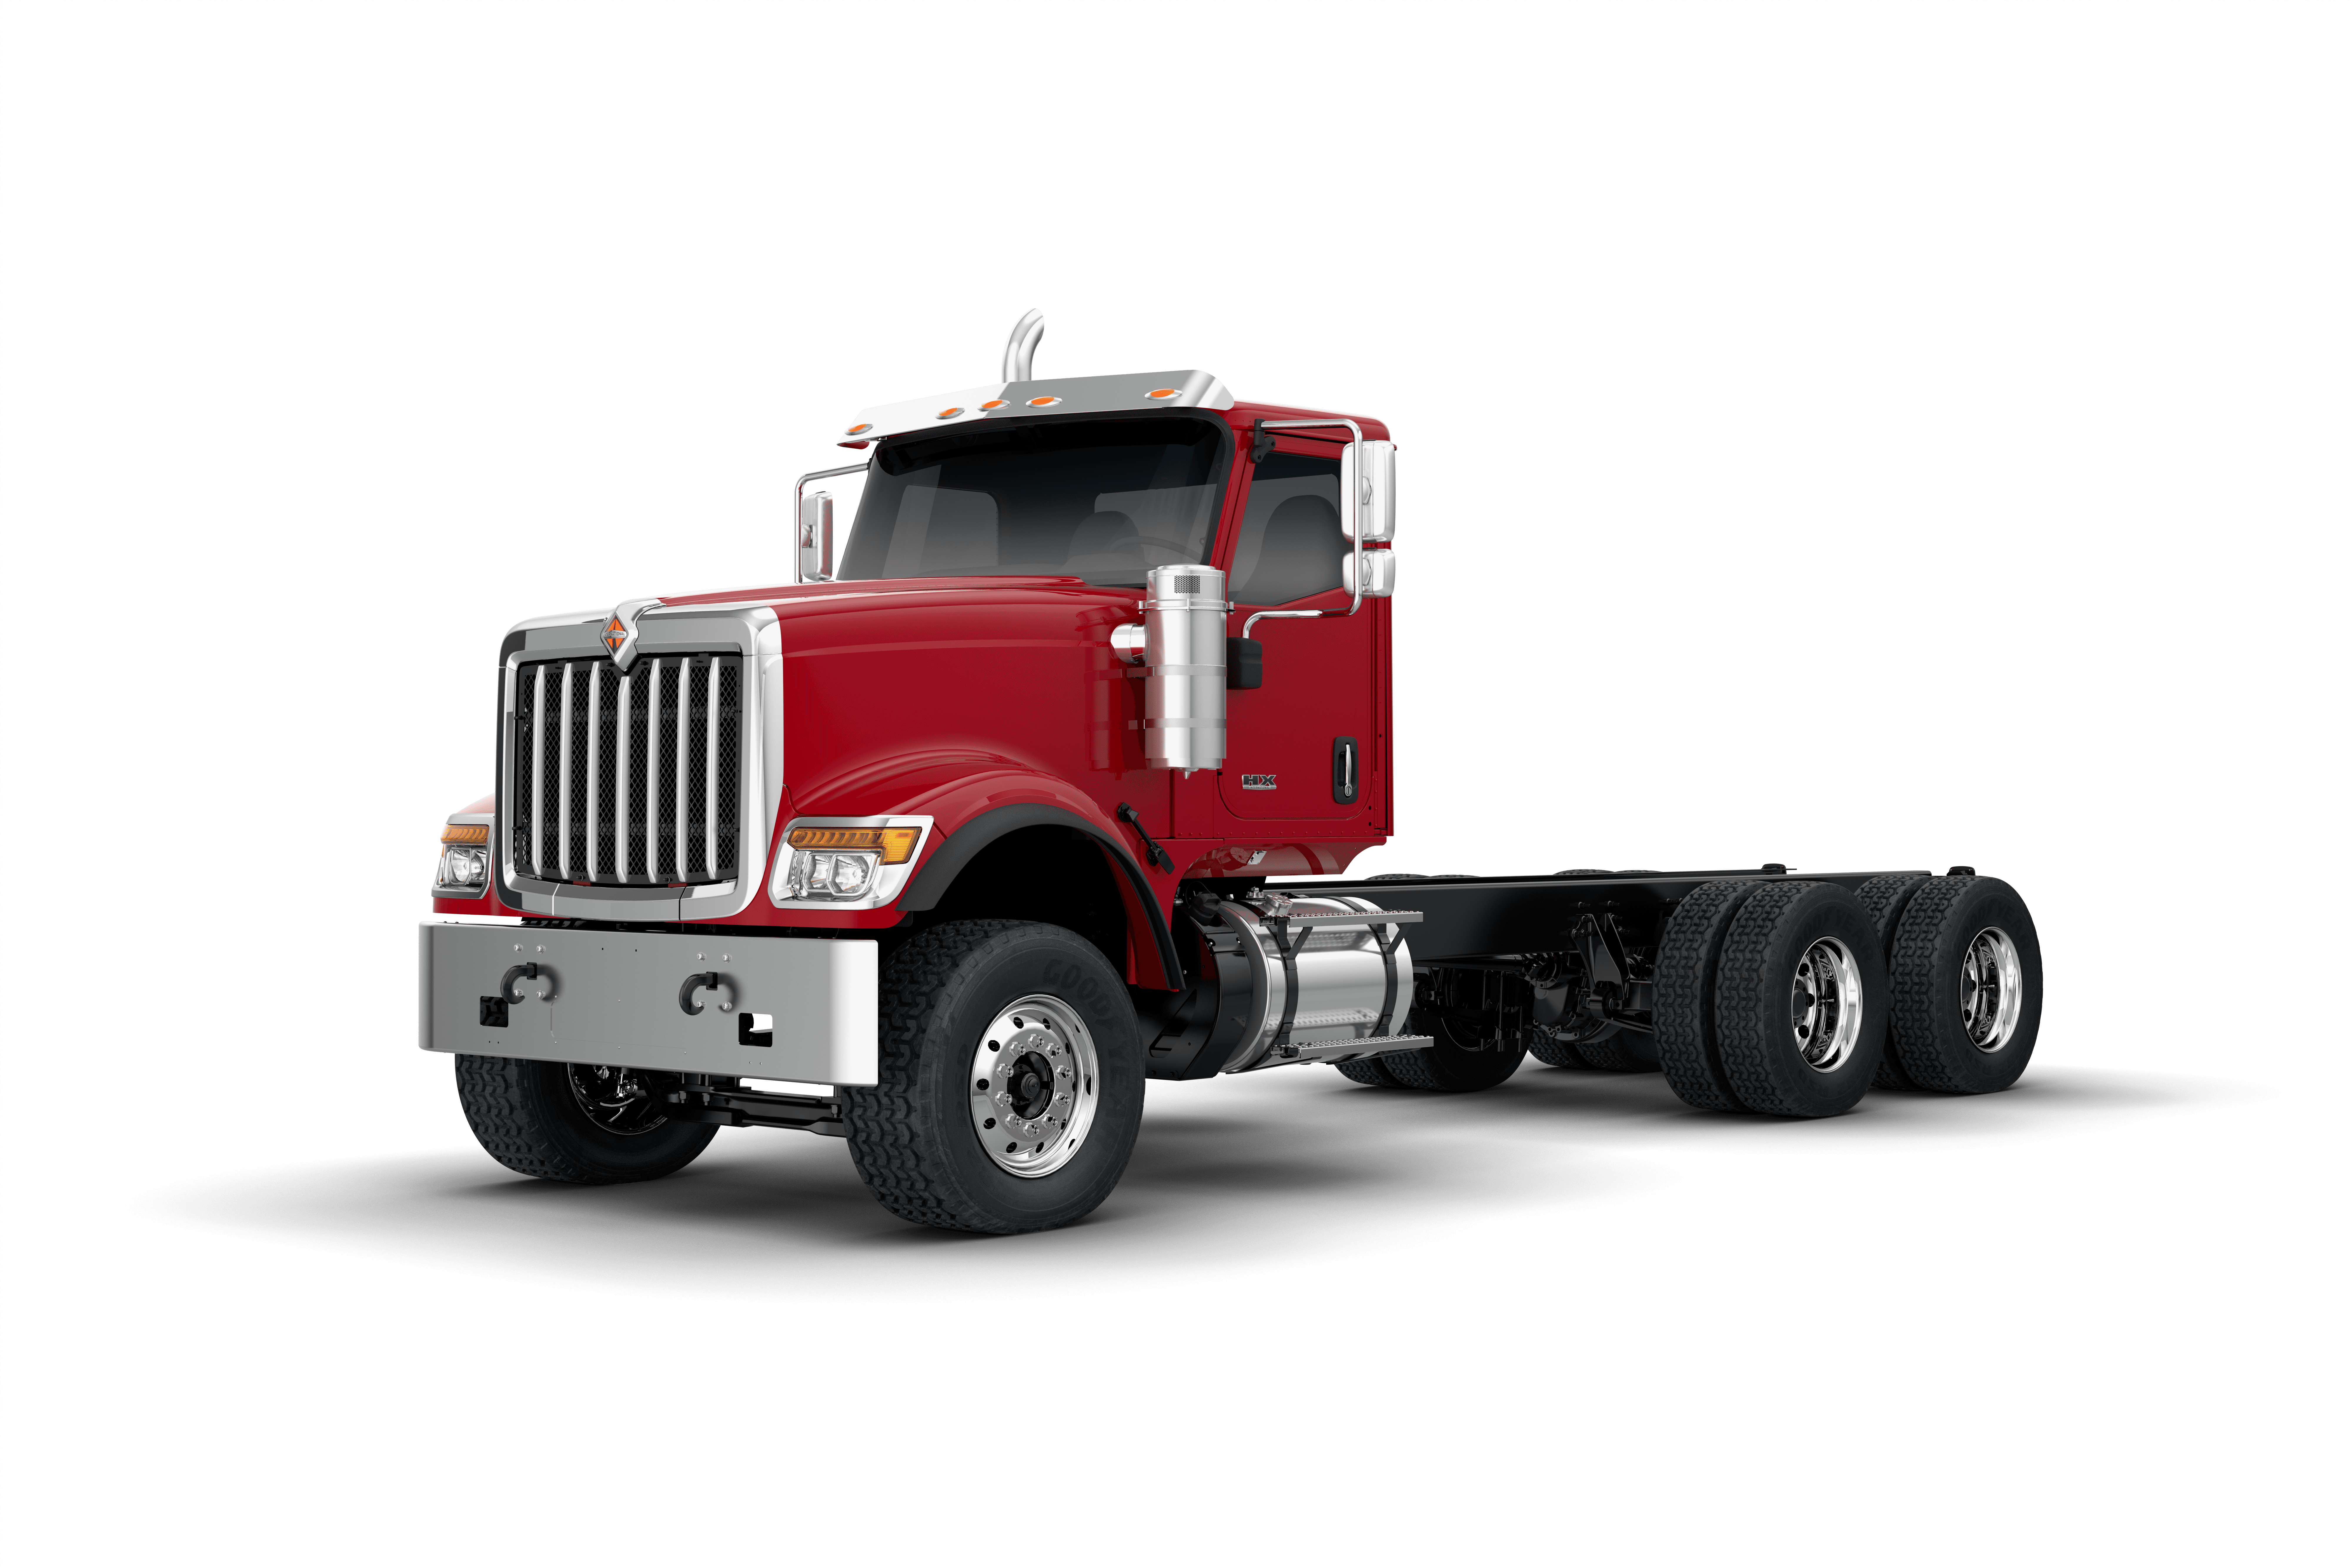 HX 520 SERIES INTERNATIONAL TRUCK